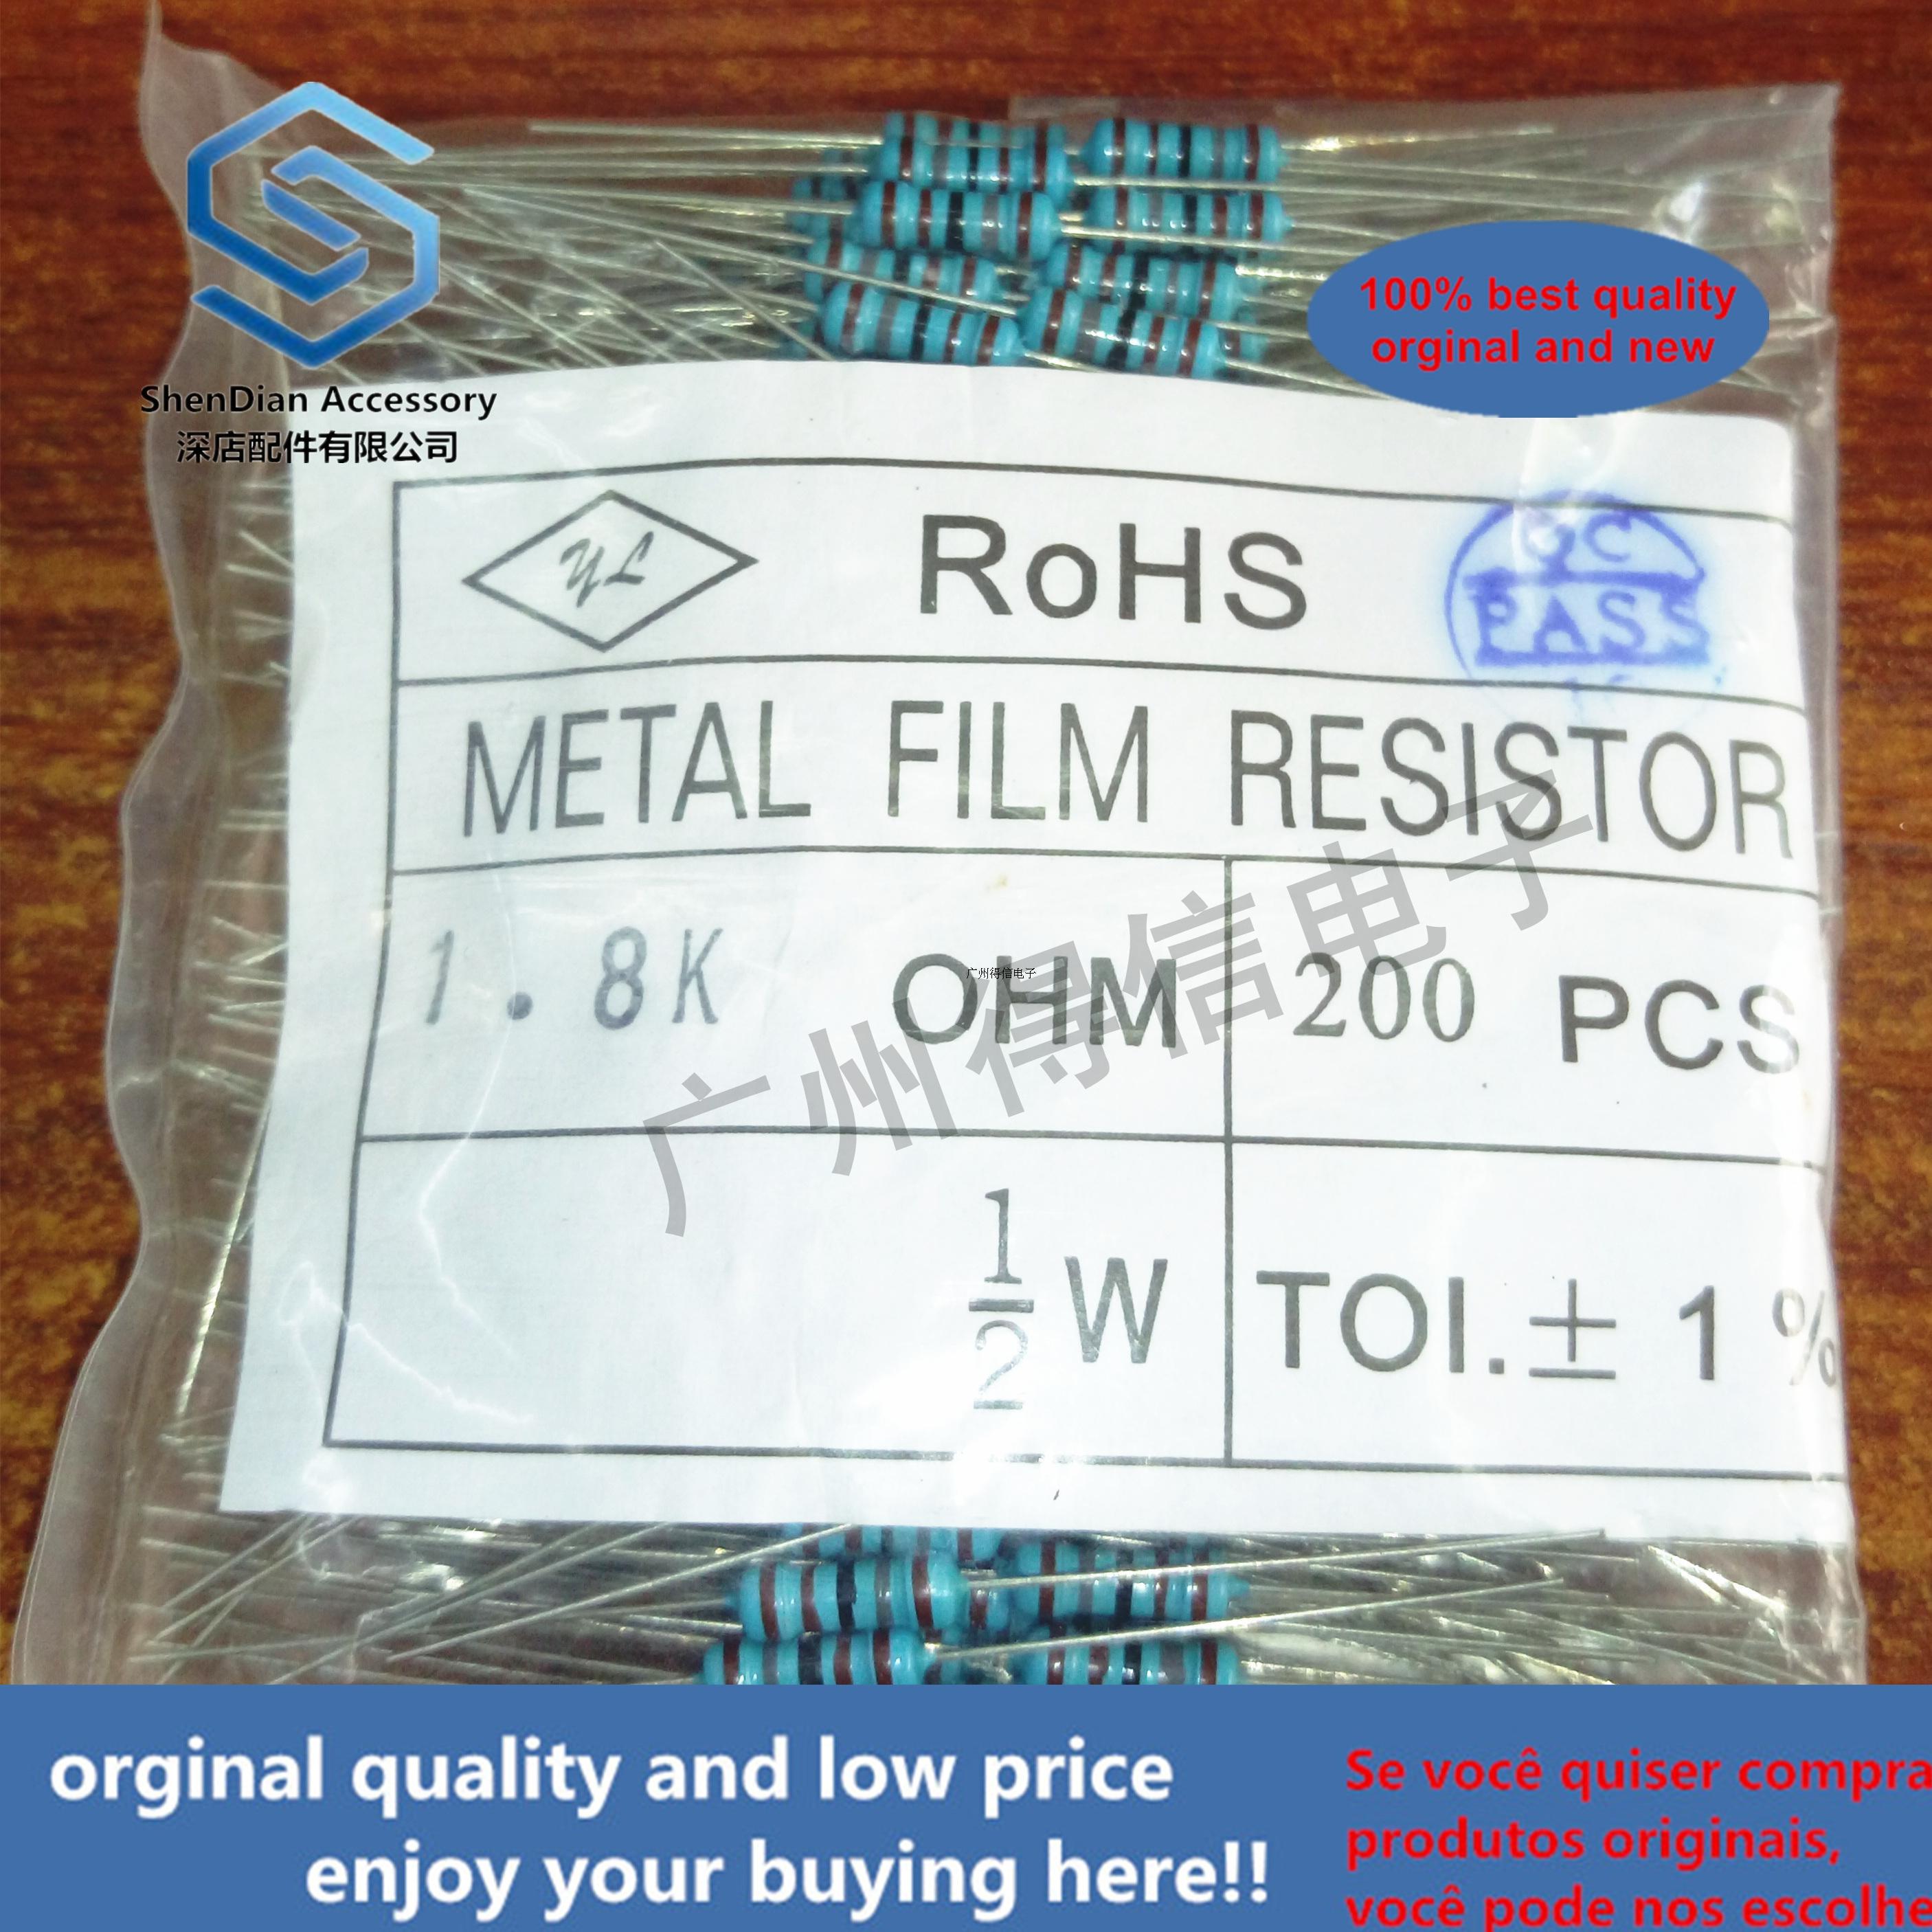 200pcs 1 / 2W 56R 56 Euro 1% Brand New Metal Film Iron Feet Resistance Bag 200 Pcs Per Pack